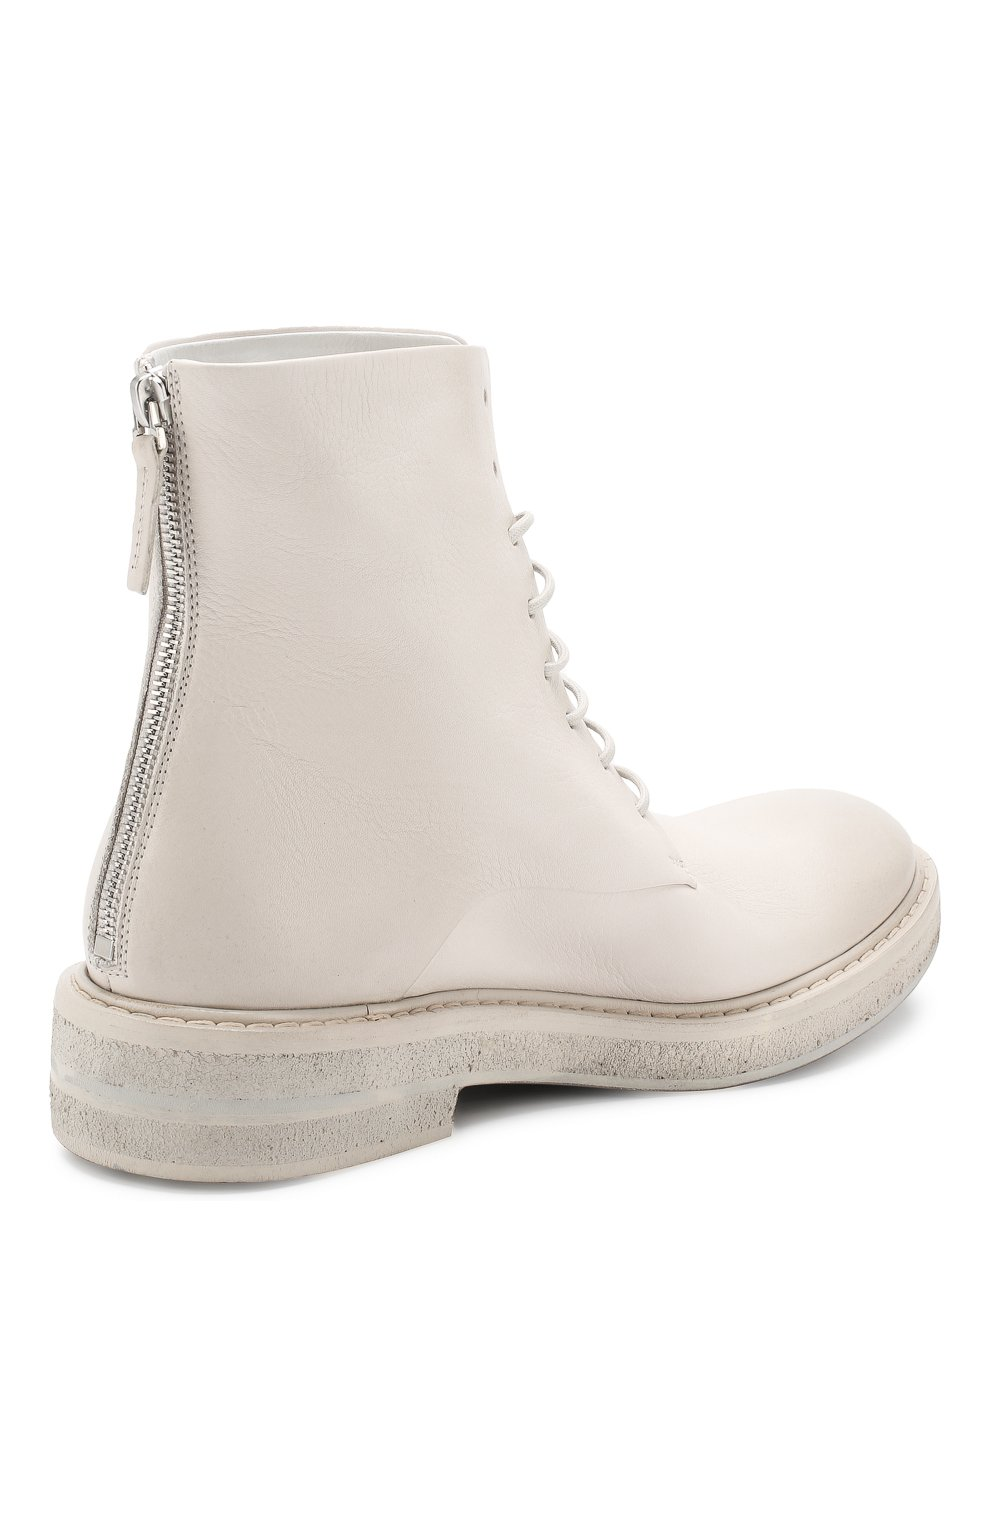 Женские кожаные ботинки MARSELL кремвого цвета, арт. MW2952/VIT.FI0RE V0L. | Фото 4